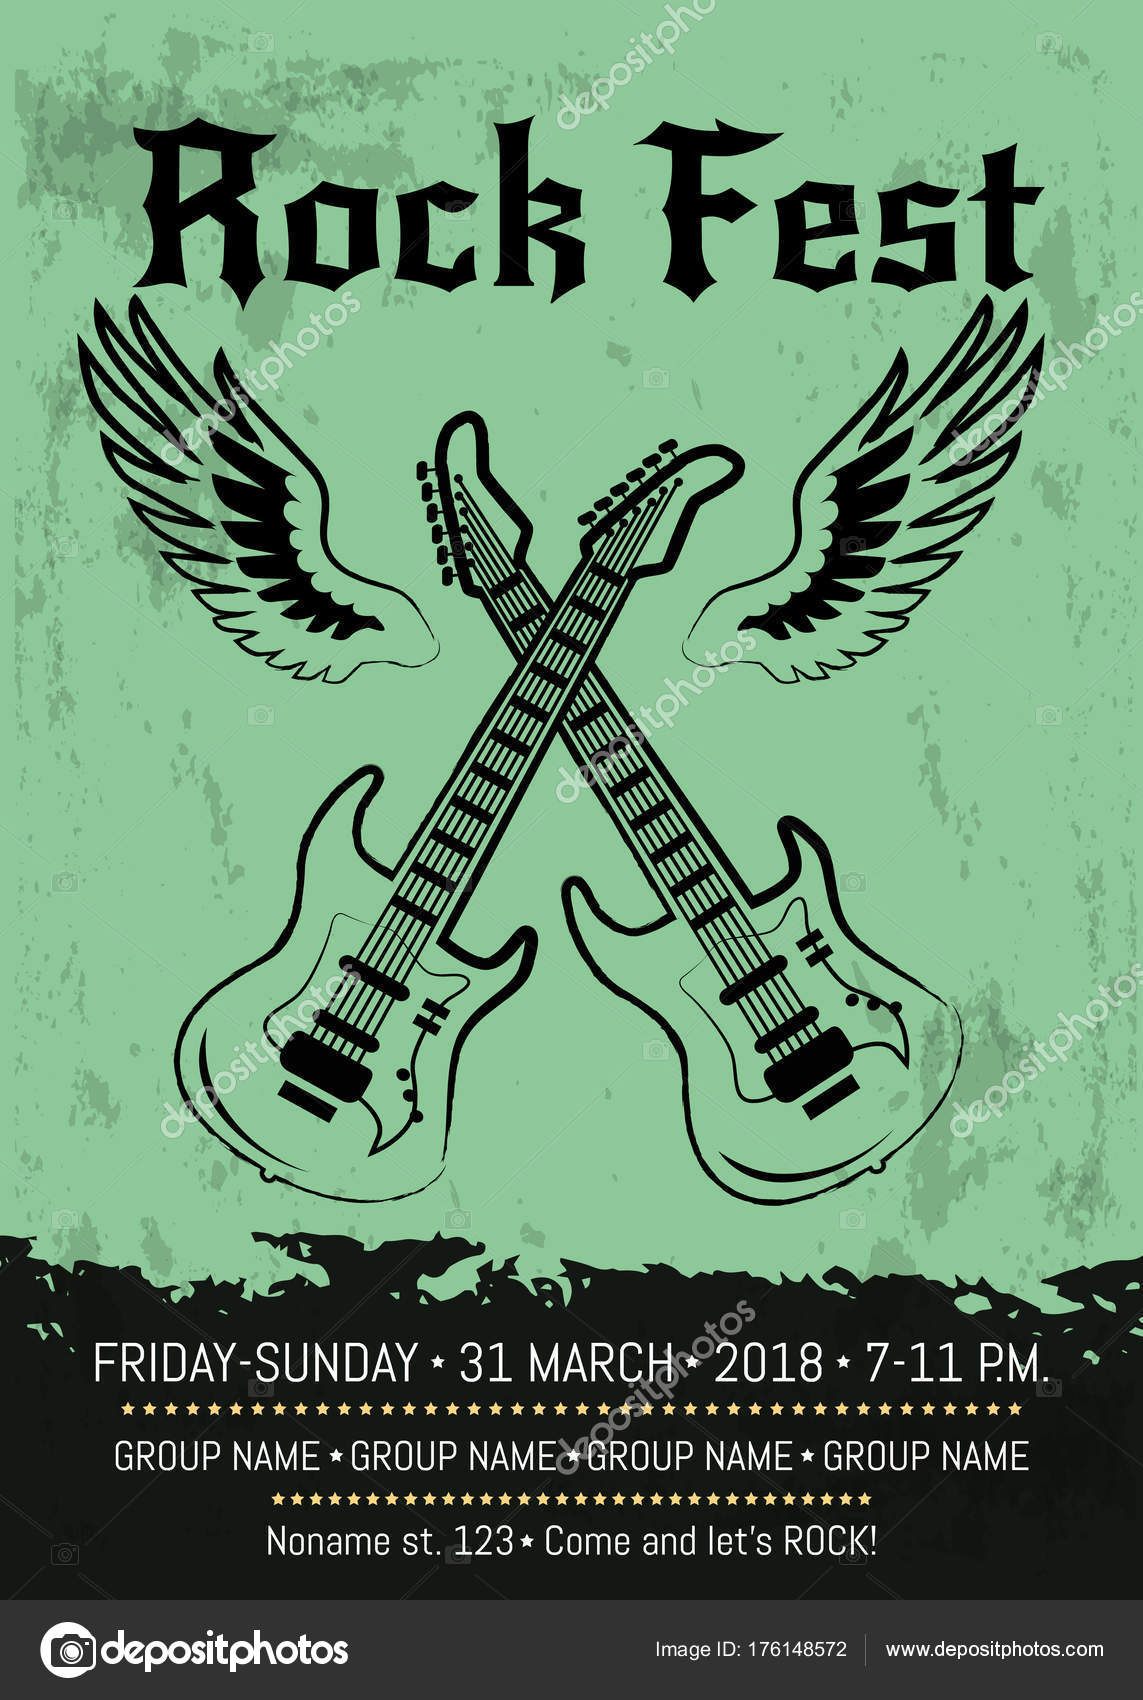 rock fest party announcement poster design stock vector robuart